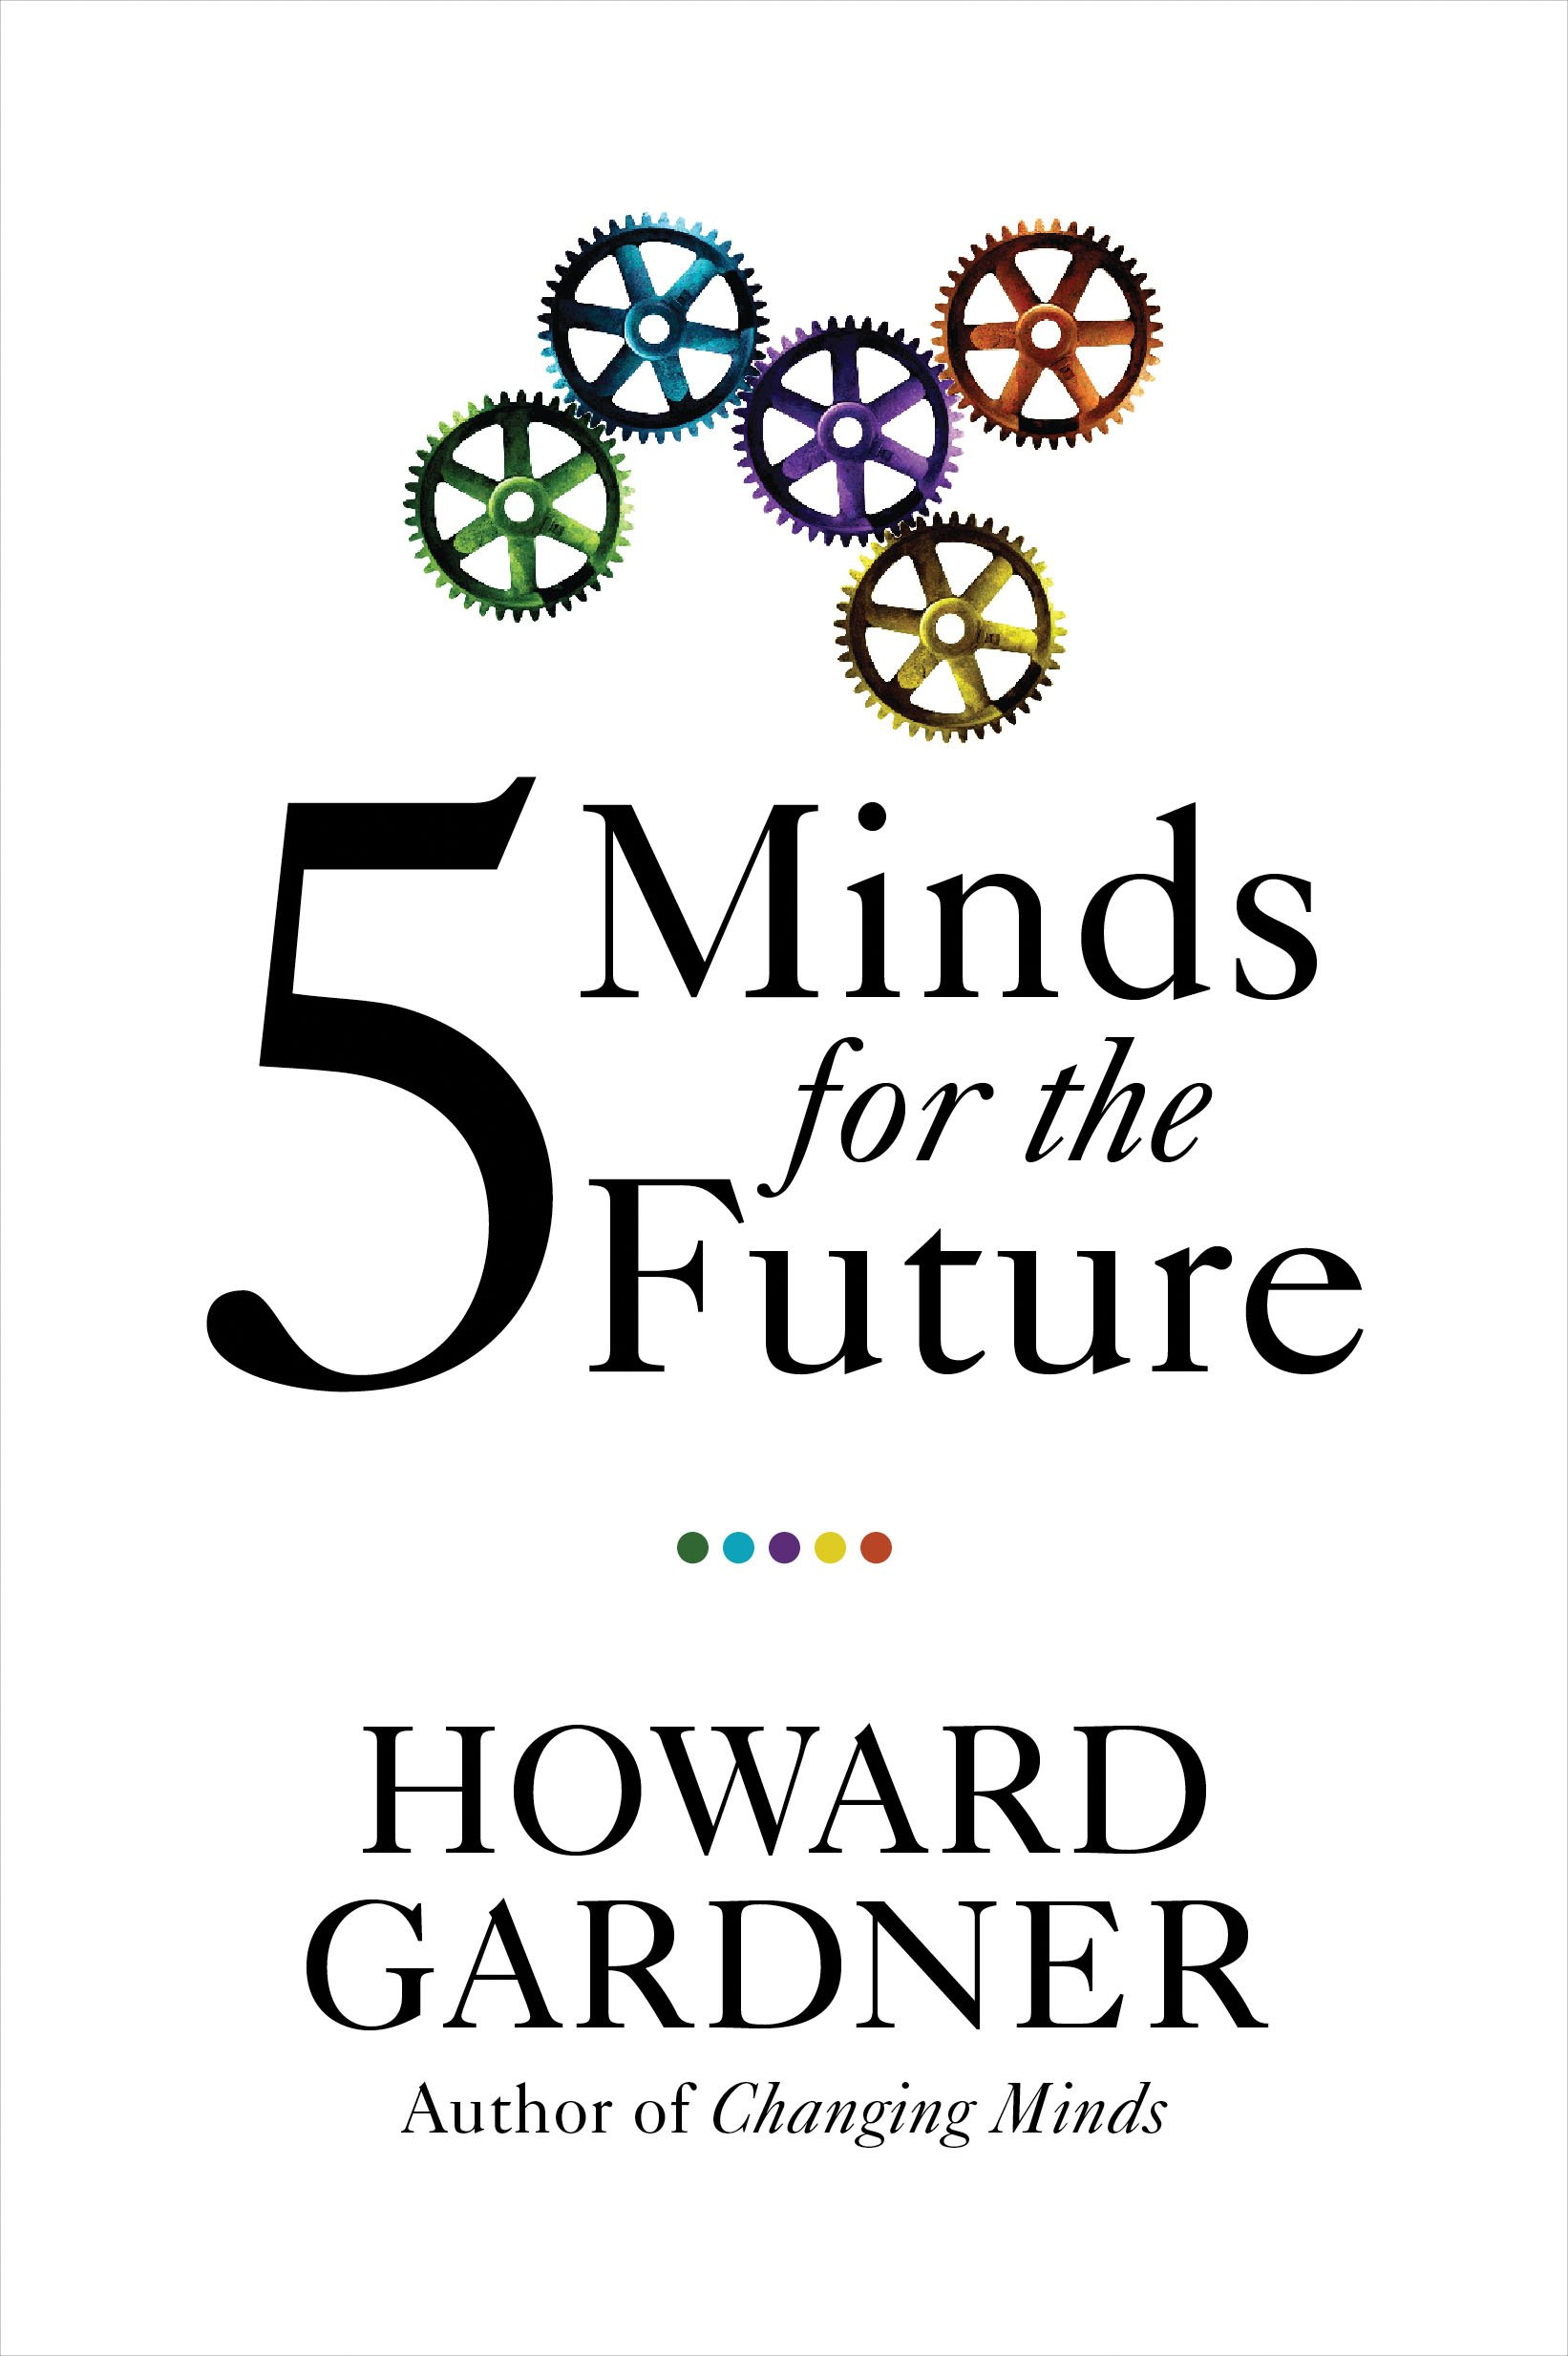 Five Minds for the Future: Amazon.de: Howard Gardner: Fremdsprachige ...